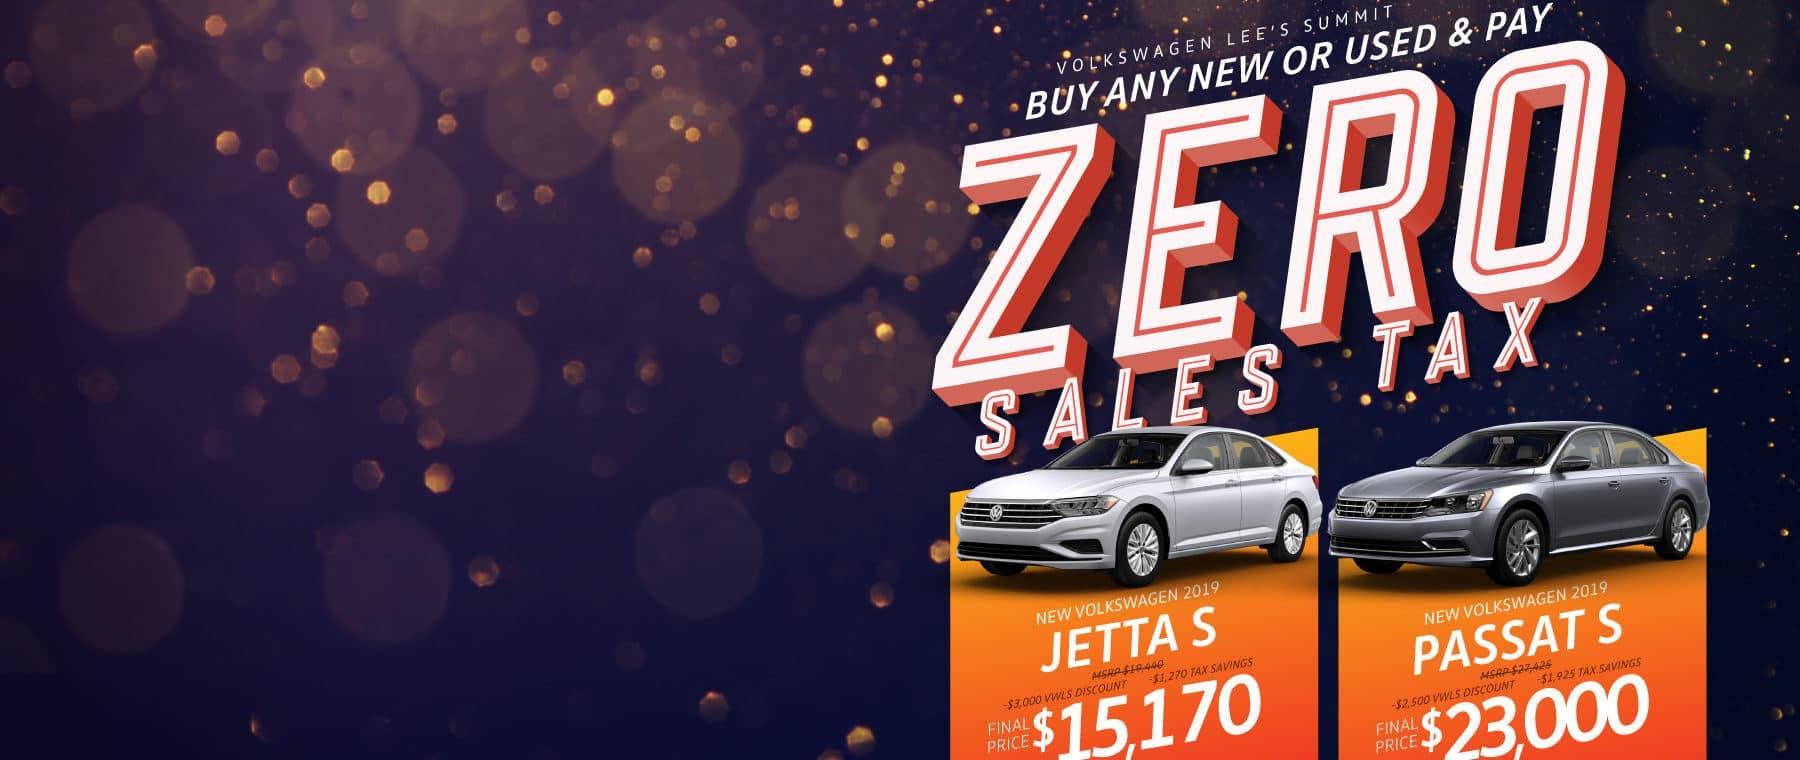 Pay Zero Sales Tax at Volkswagen Lee's Summit